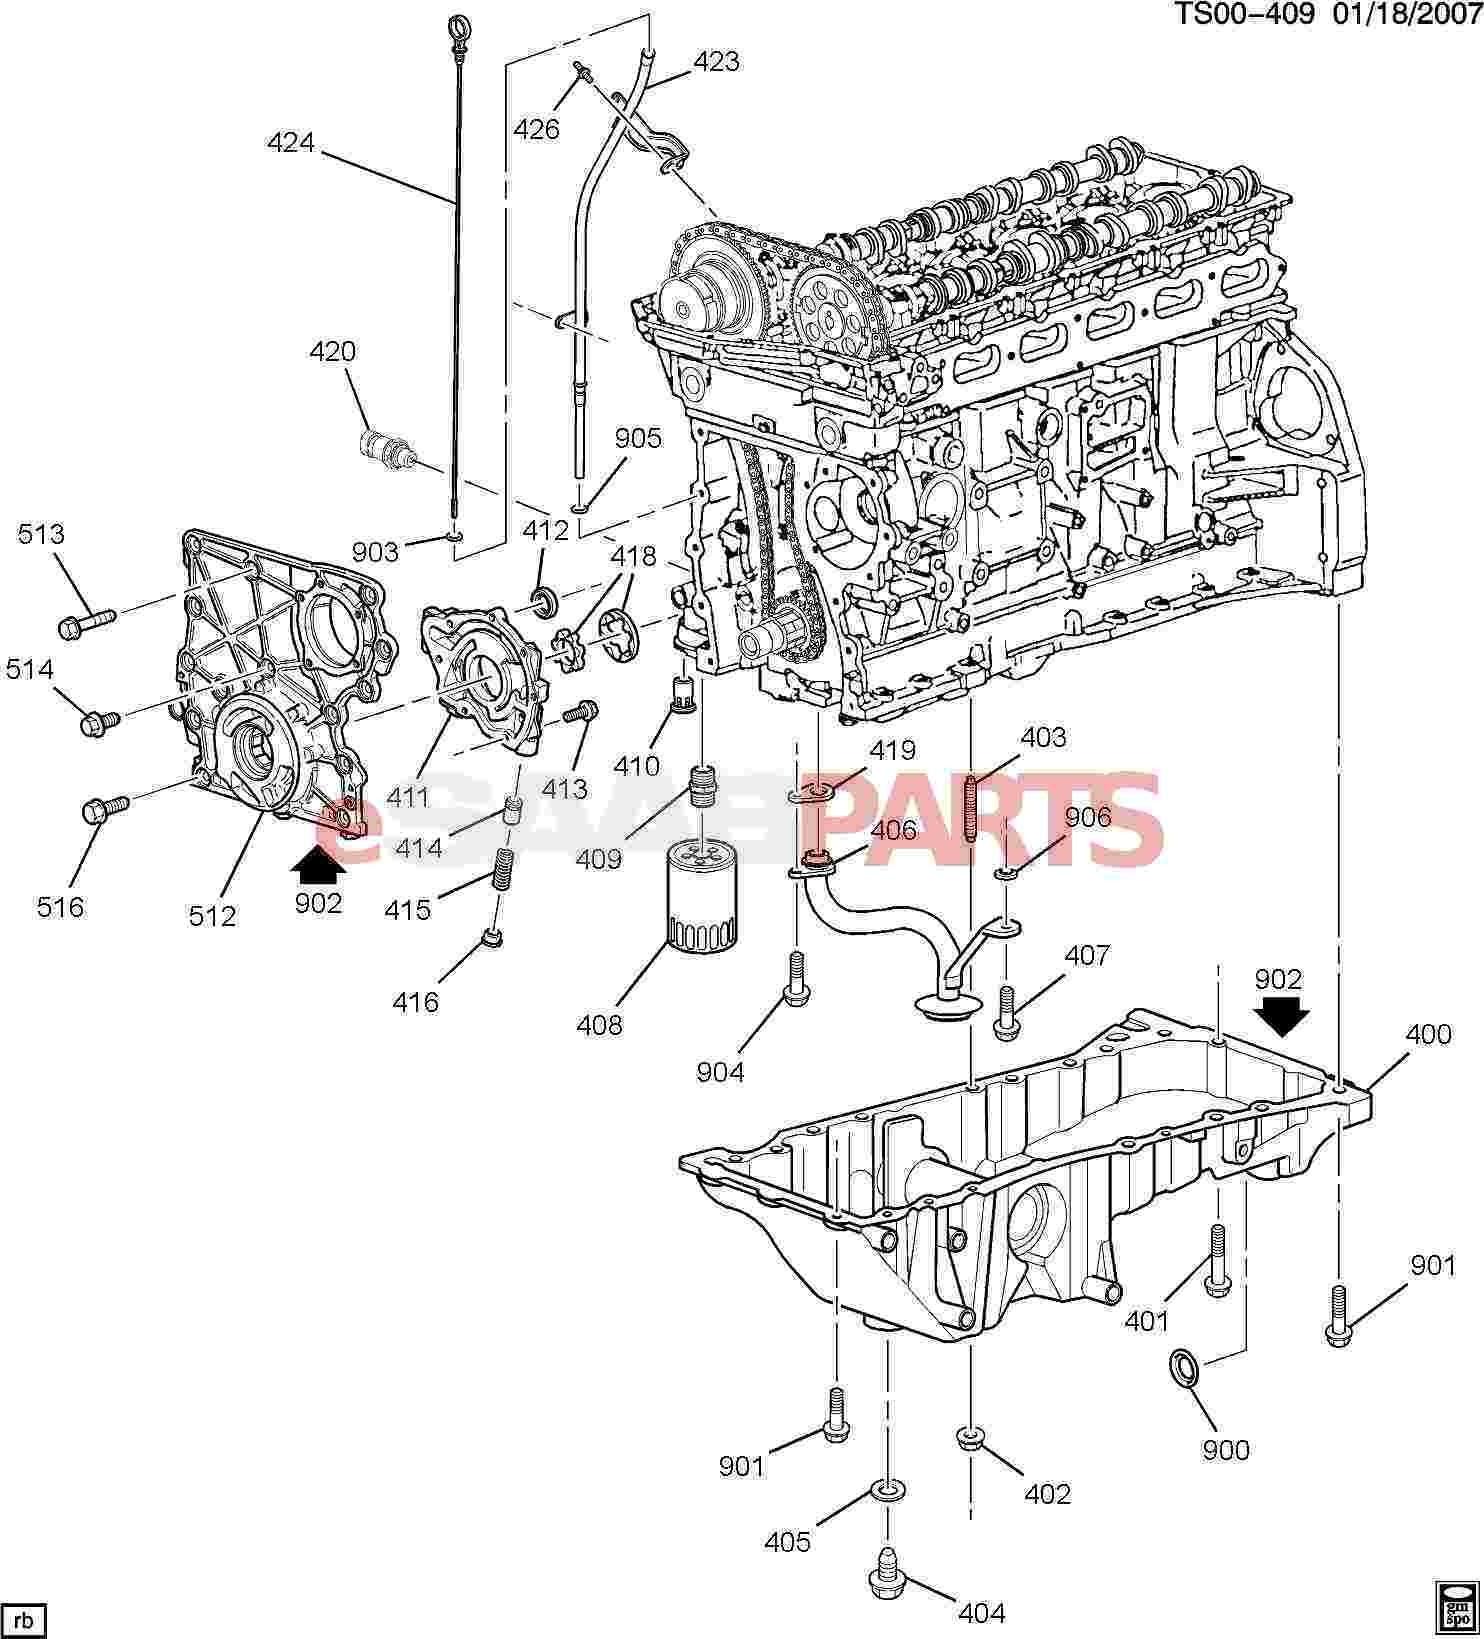 2003 Chevy Blazer Engine Diagram ] Saab Hexagon Screw Genuine Saab Parts From Esaabparts Of 2003 Chevy Blazer Engine Diagram